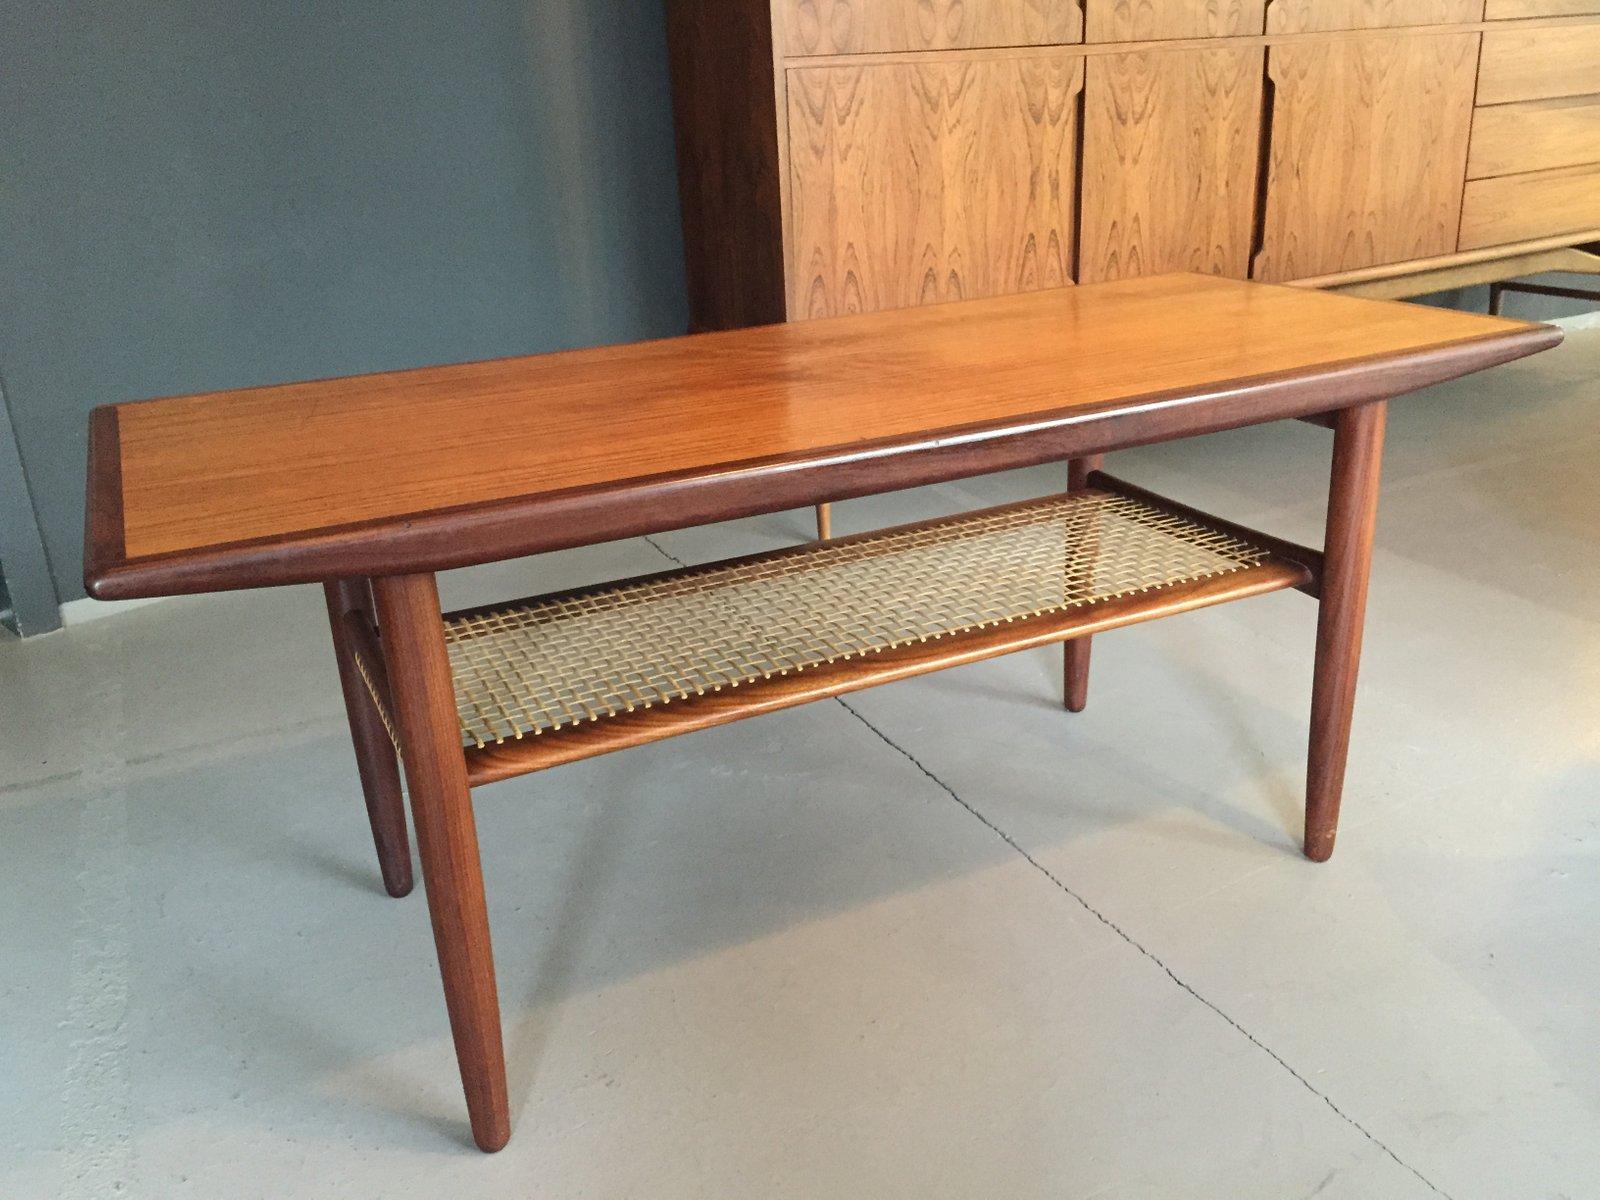 Danish teak coffee table from cf christensen as 1960 for sale danish teak coffee table from cf christensen as 1960 for sale at pamono geotapseo Images